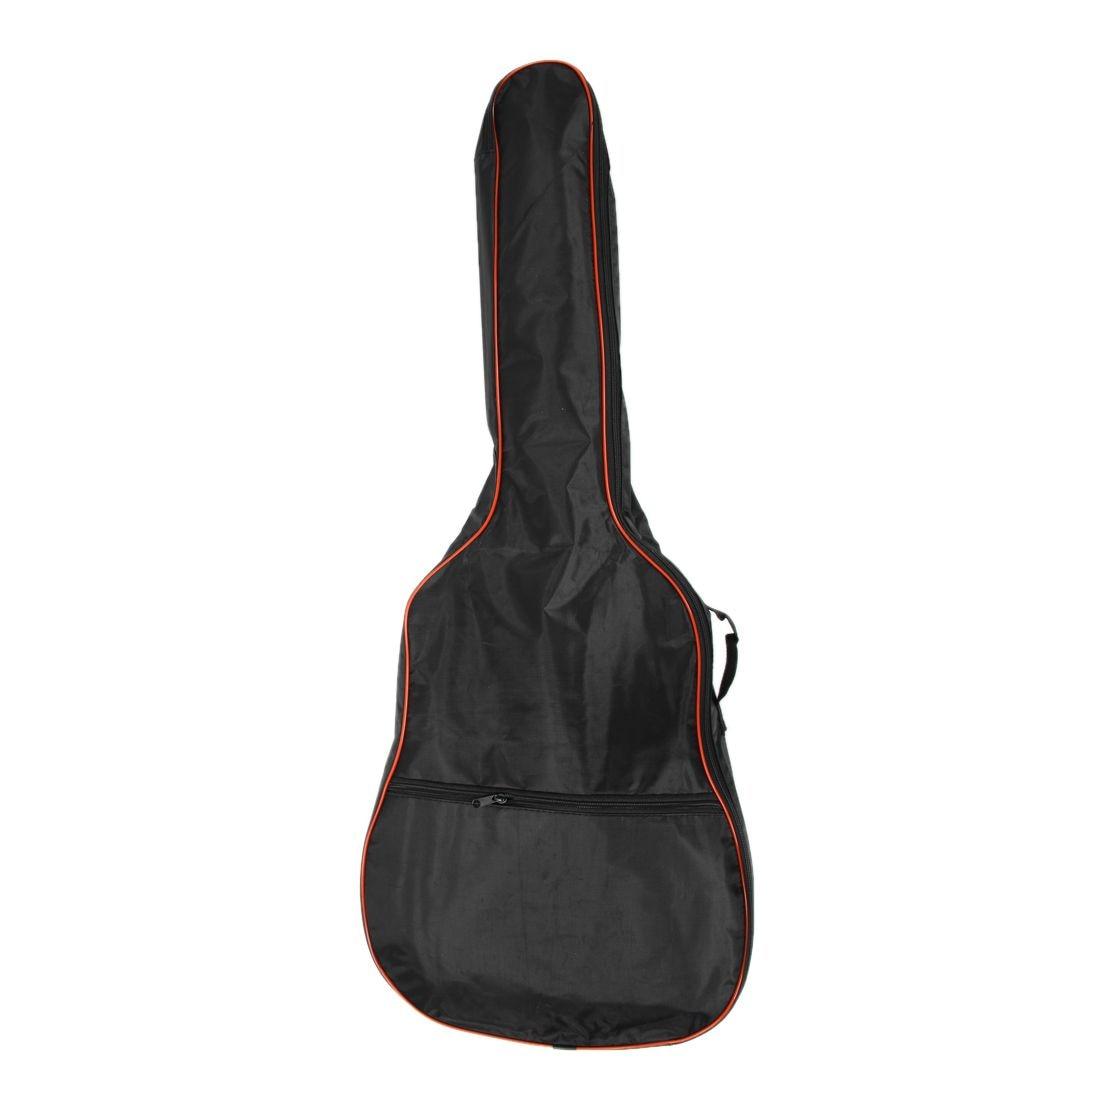 41 Inch Classical Acoustic Guitar Back Carry Cover Case Bag 5mm Shoulder Straps